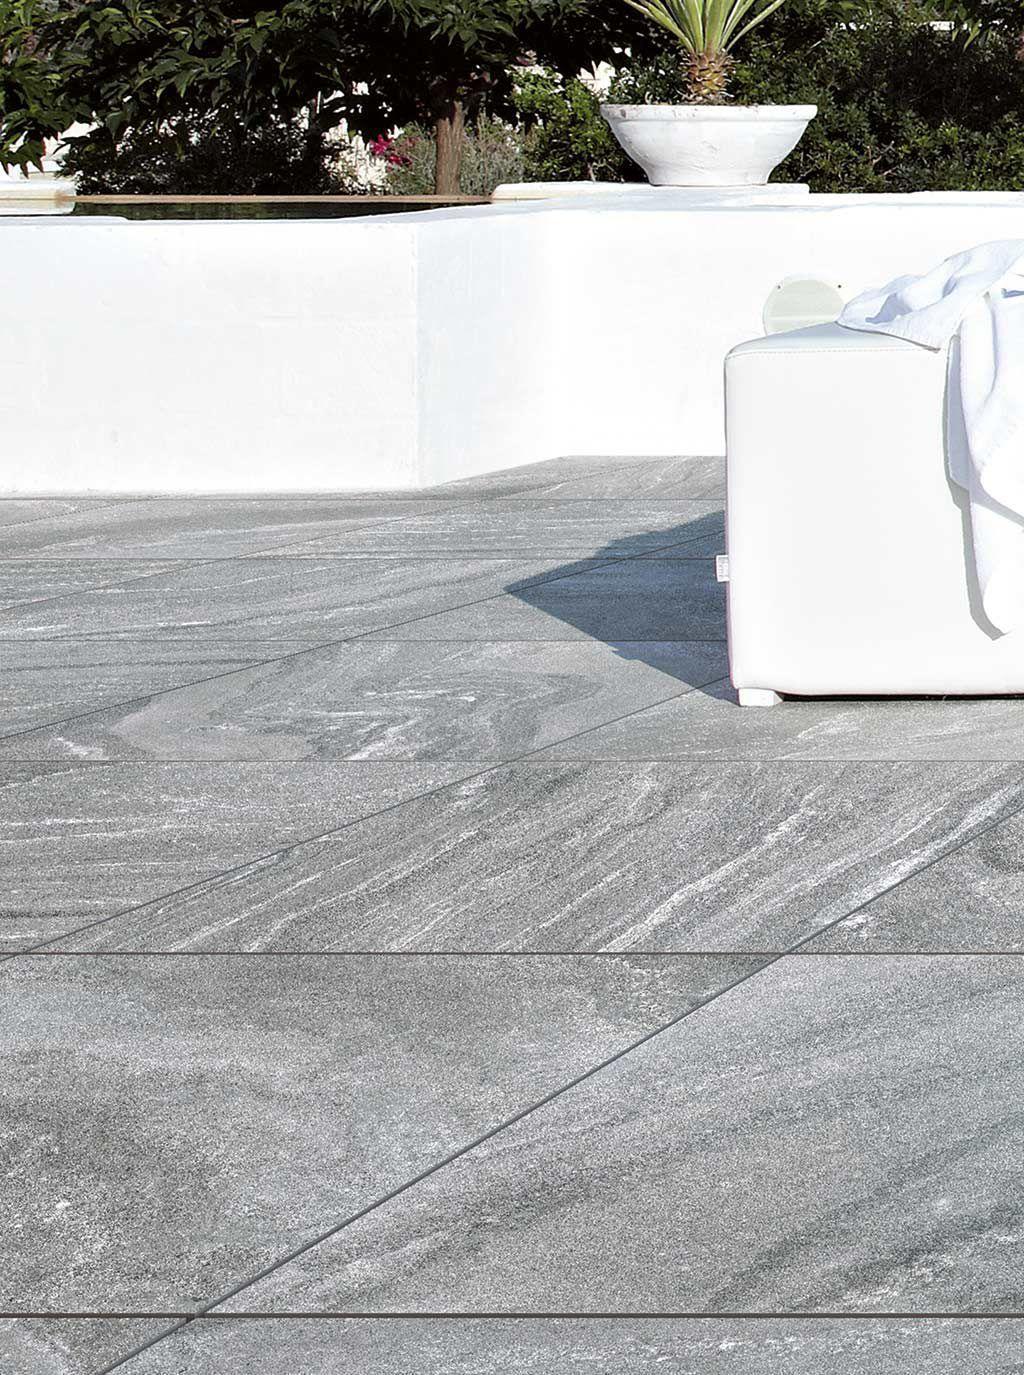 Raised tile outdoor floor porcelain stoneware tech2 raised tile outdoor floor porcelain stoneware tech2 grey floor gres doublecrazyfo Image collections